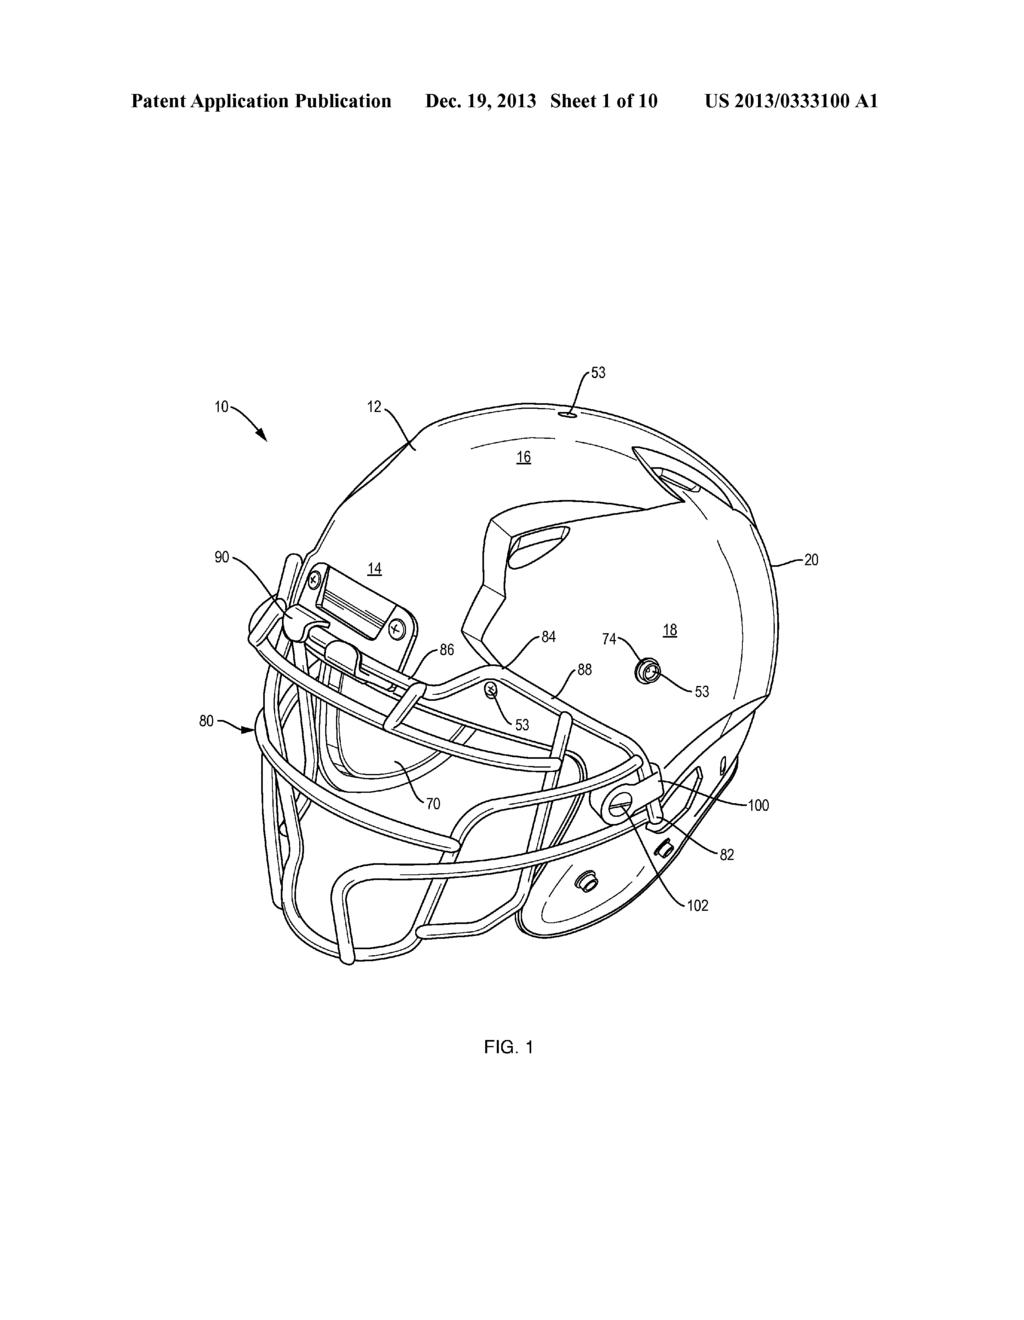 football helmet diagram schematic and image 02 rh patentsencyclopedia com